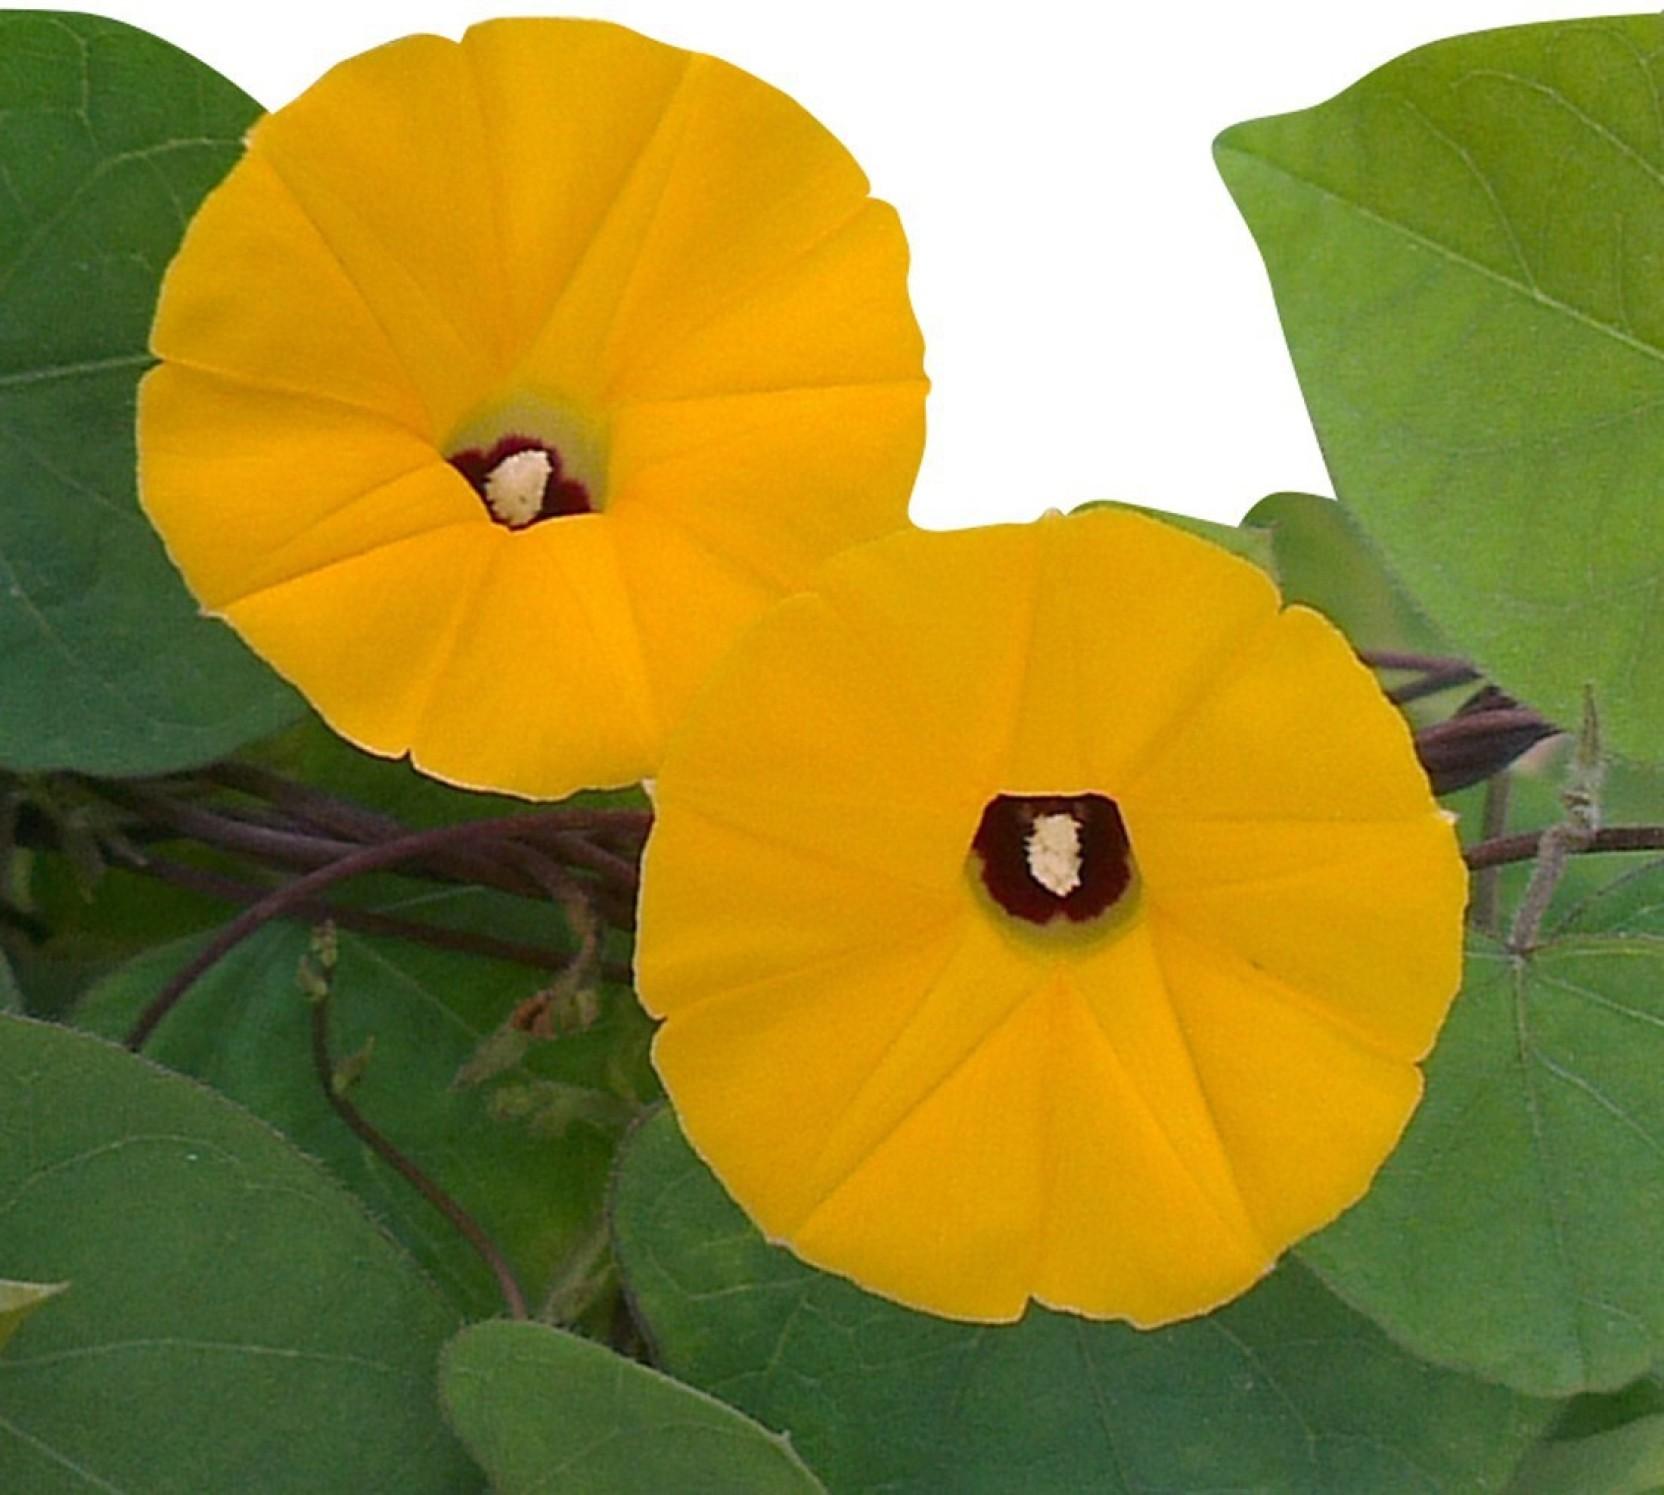 Futaba Glory Seed Price in India - Buy Futaba Glory Seed online at